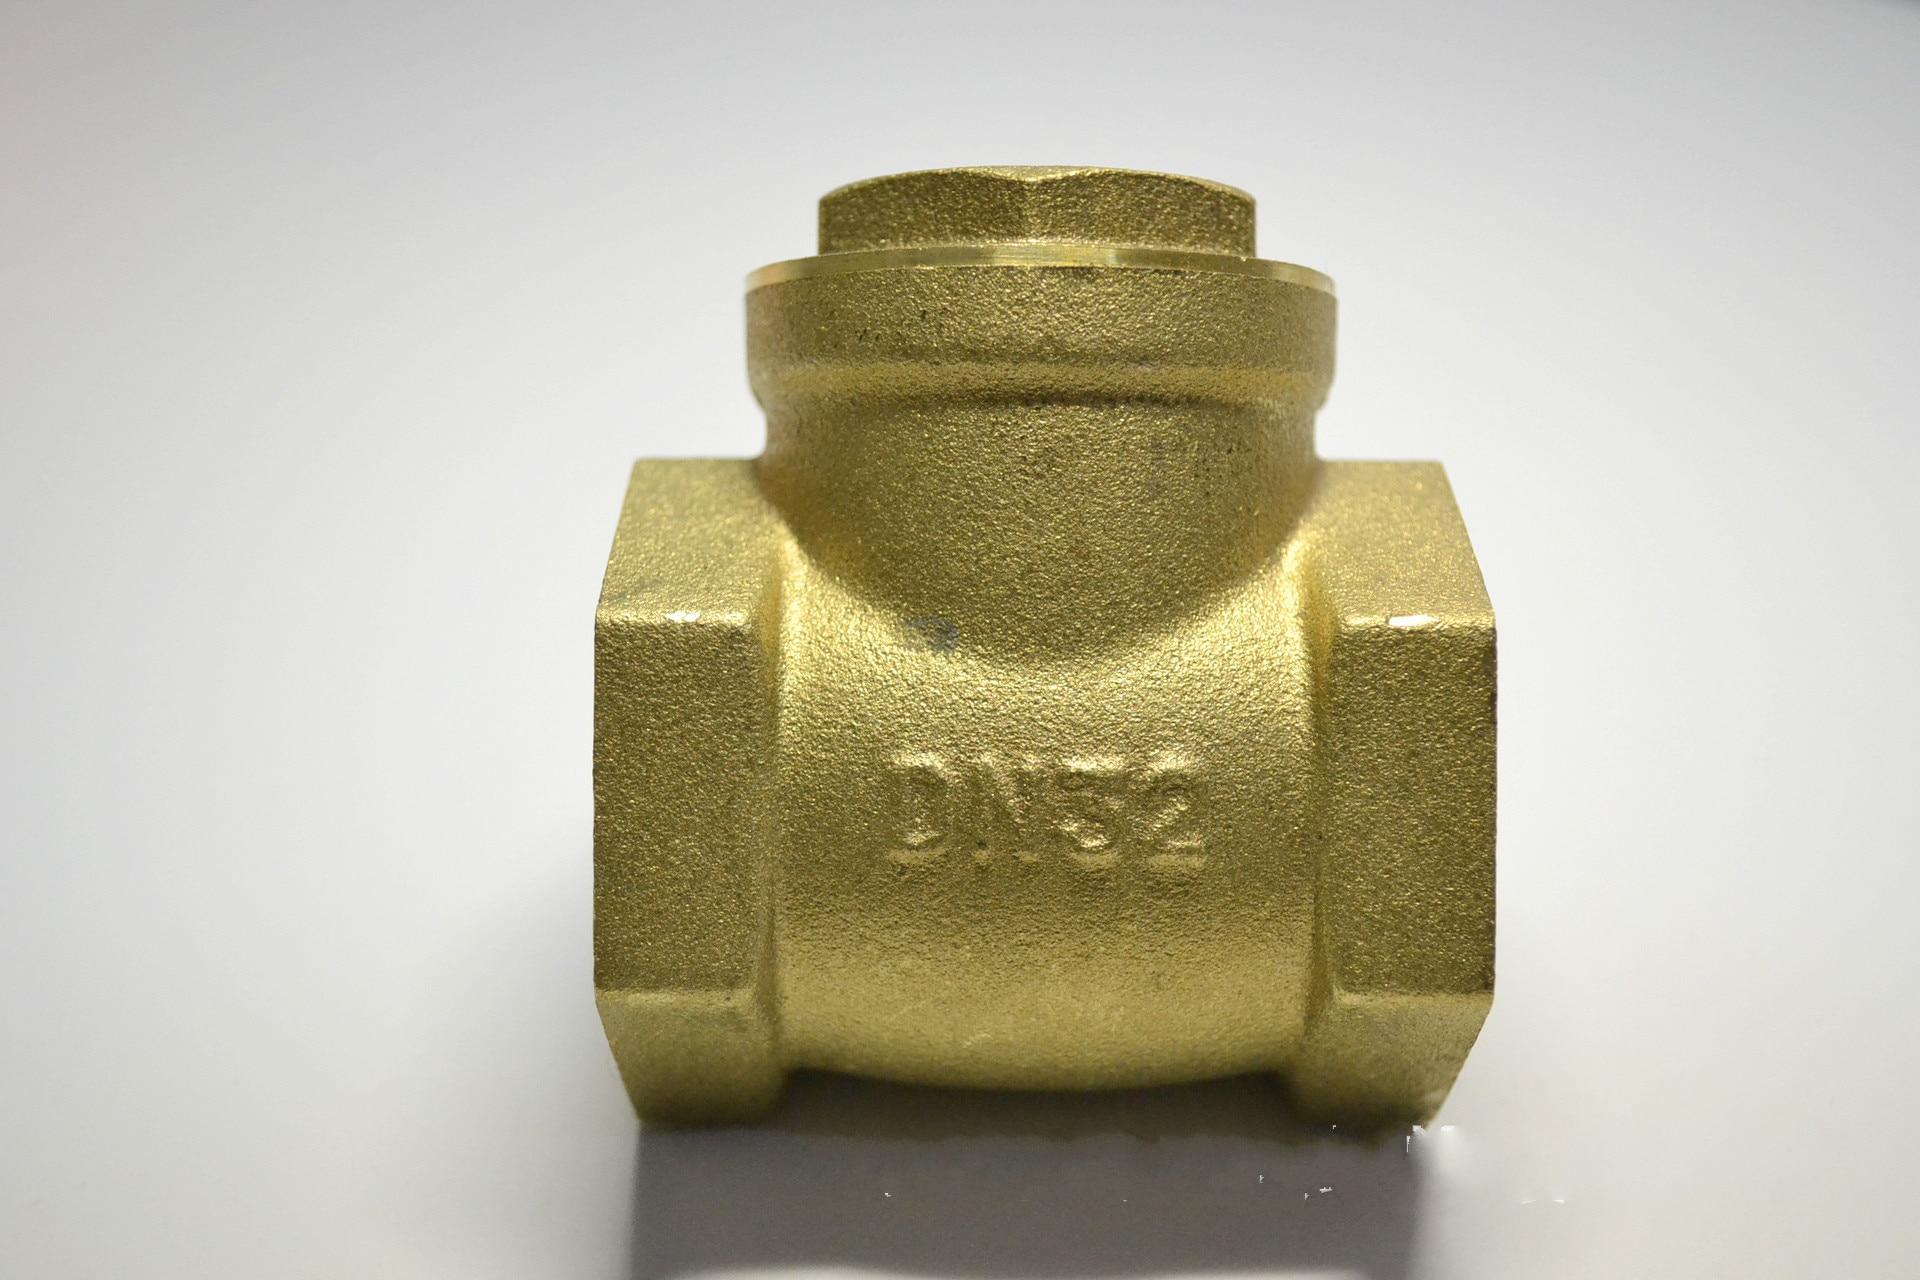 DN32  BSPP Swing Check Valve Prevent Water Backflow Golden dn25 golden 1 inch female bspp thread swing check valve high pressure 32mm thread